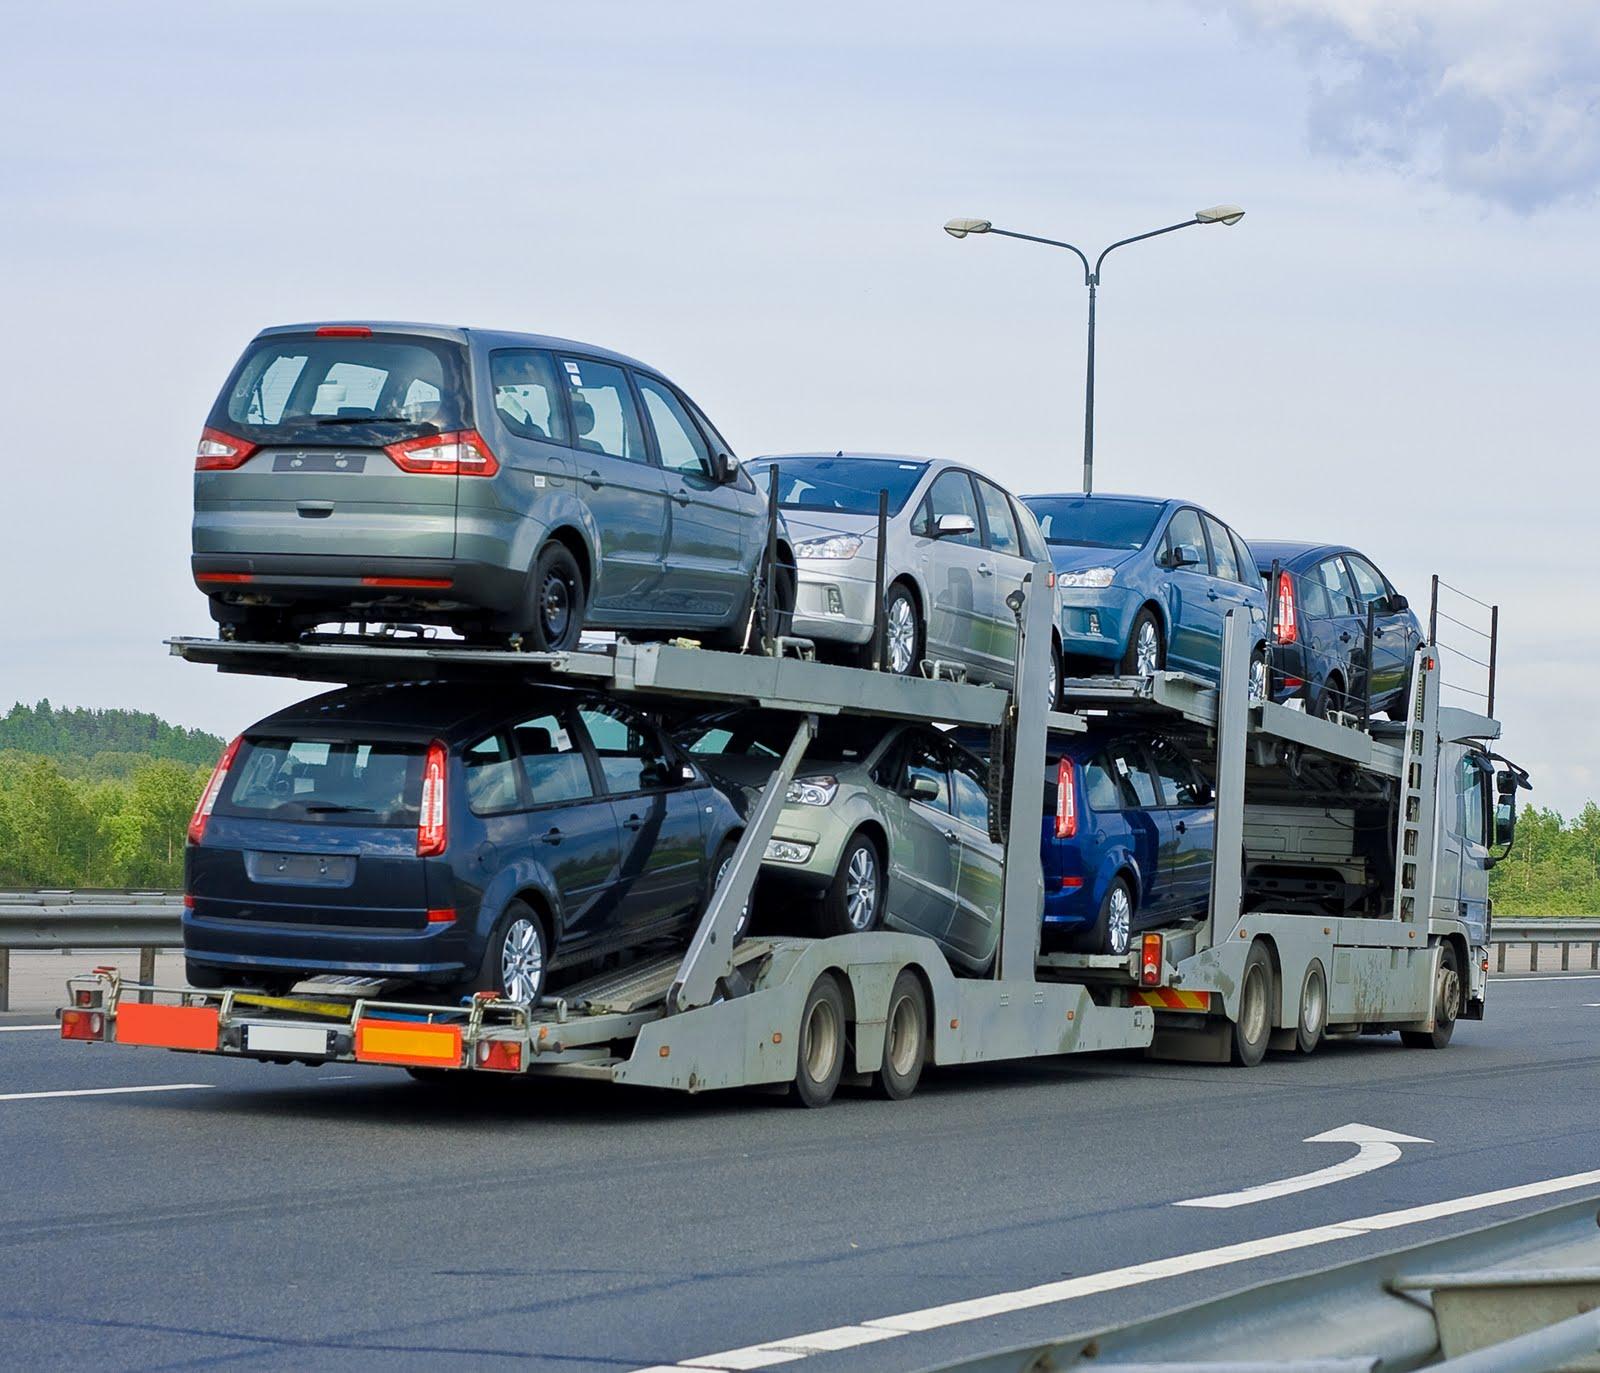 Carmoza Auto Transport: Moving A Car On A Budget